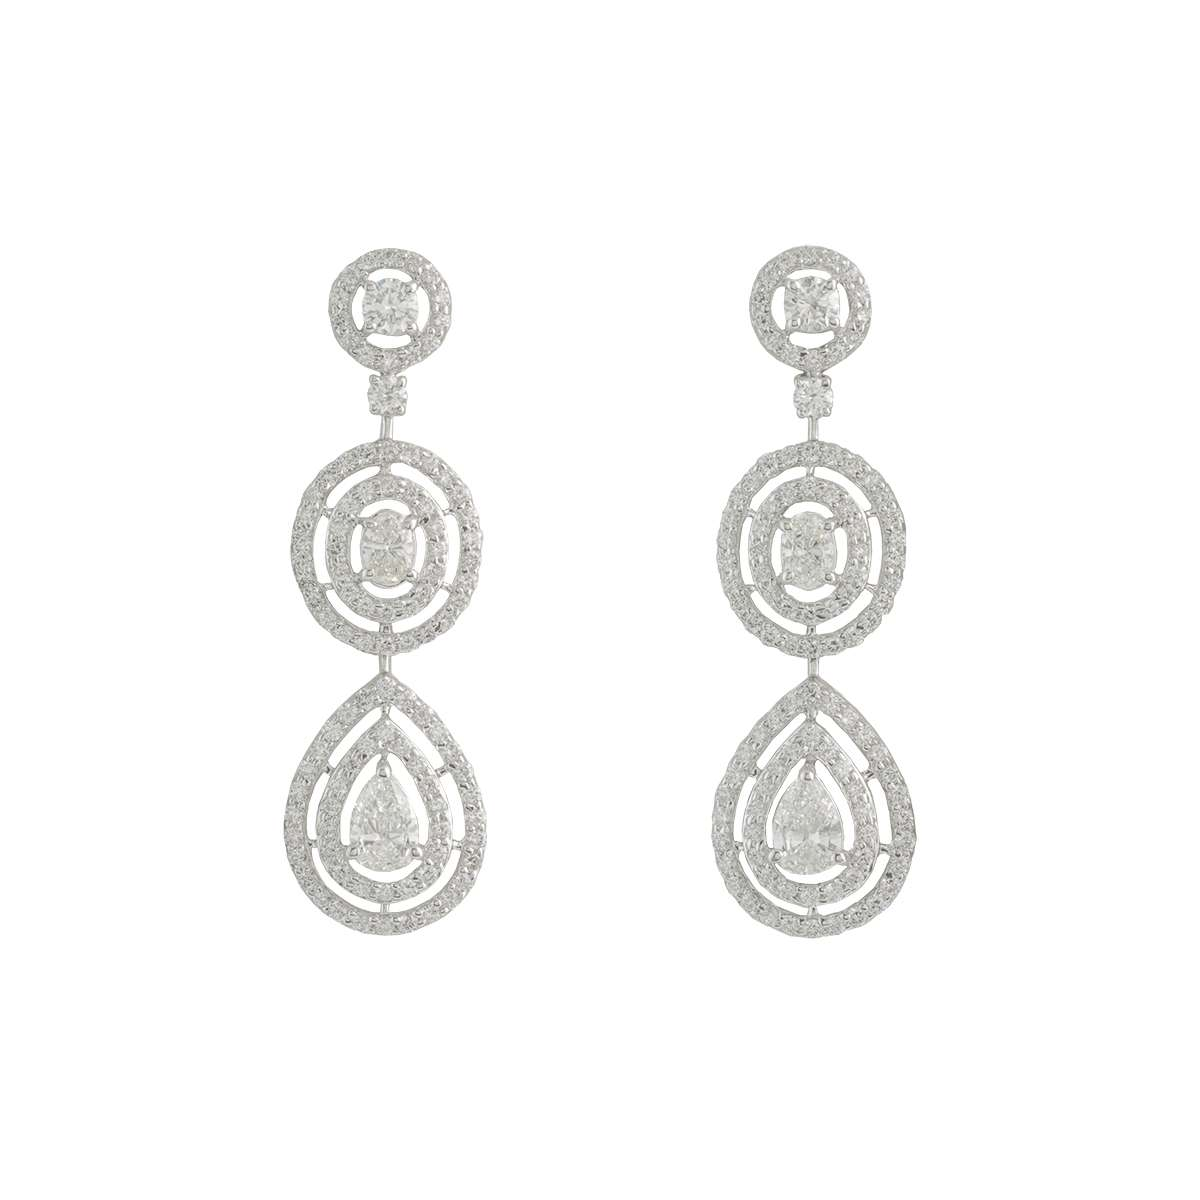 White Gold Diamond Drop Earrings 3.97ct G-H/VS